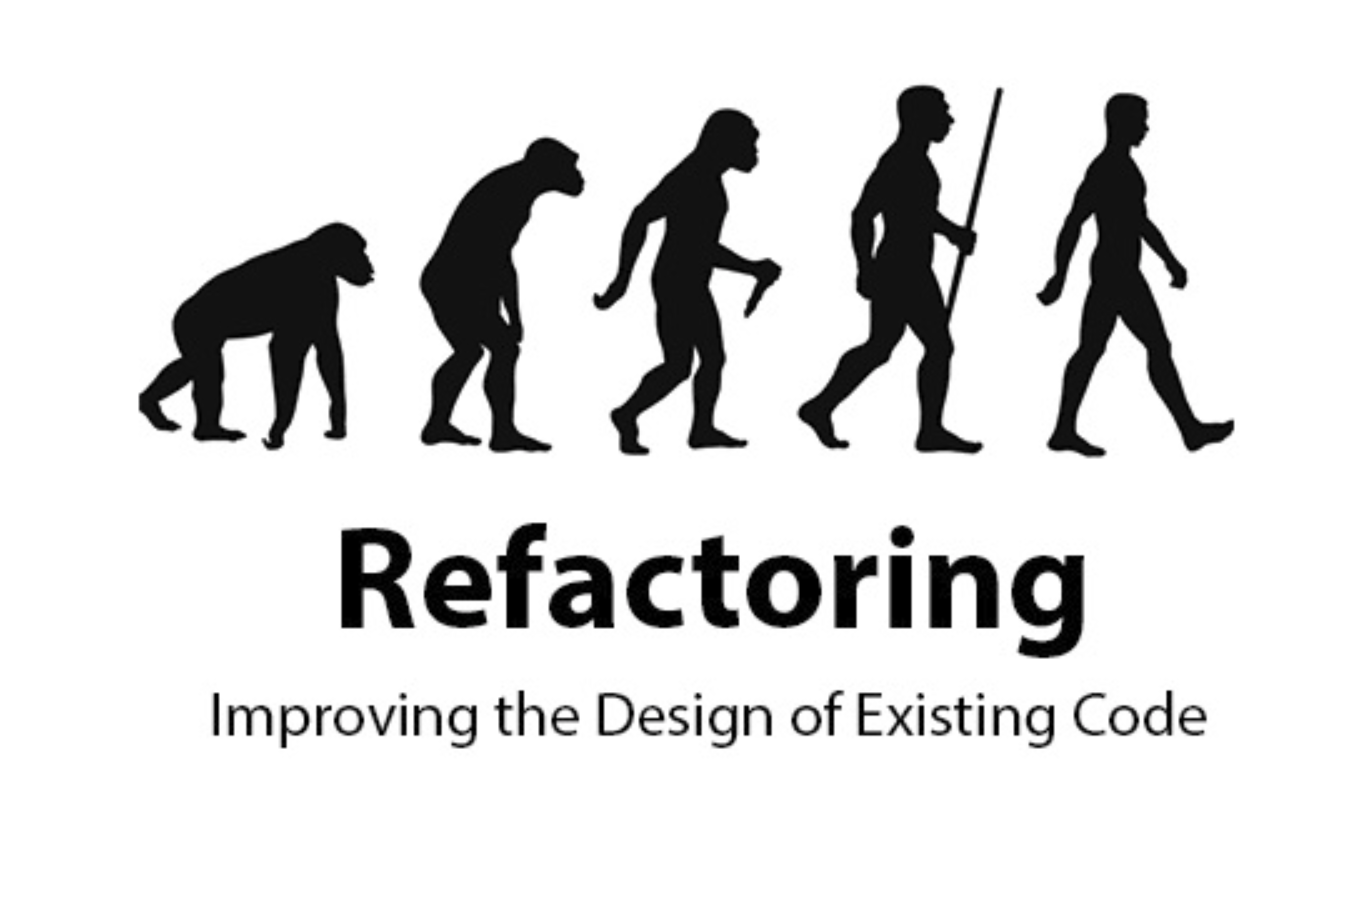 src/images/code-refactoring.png